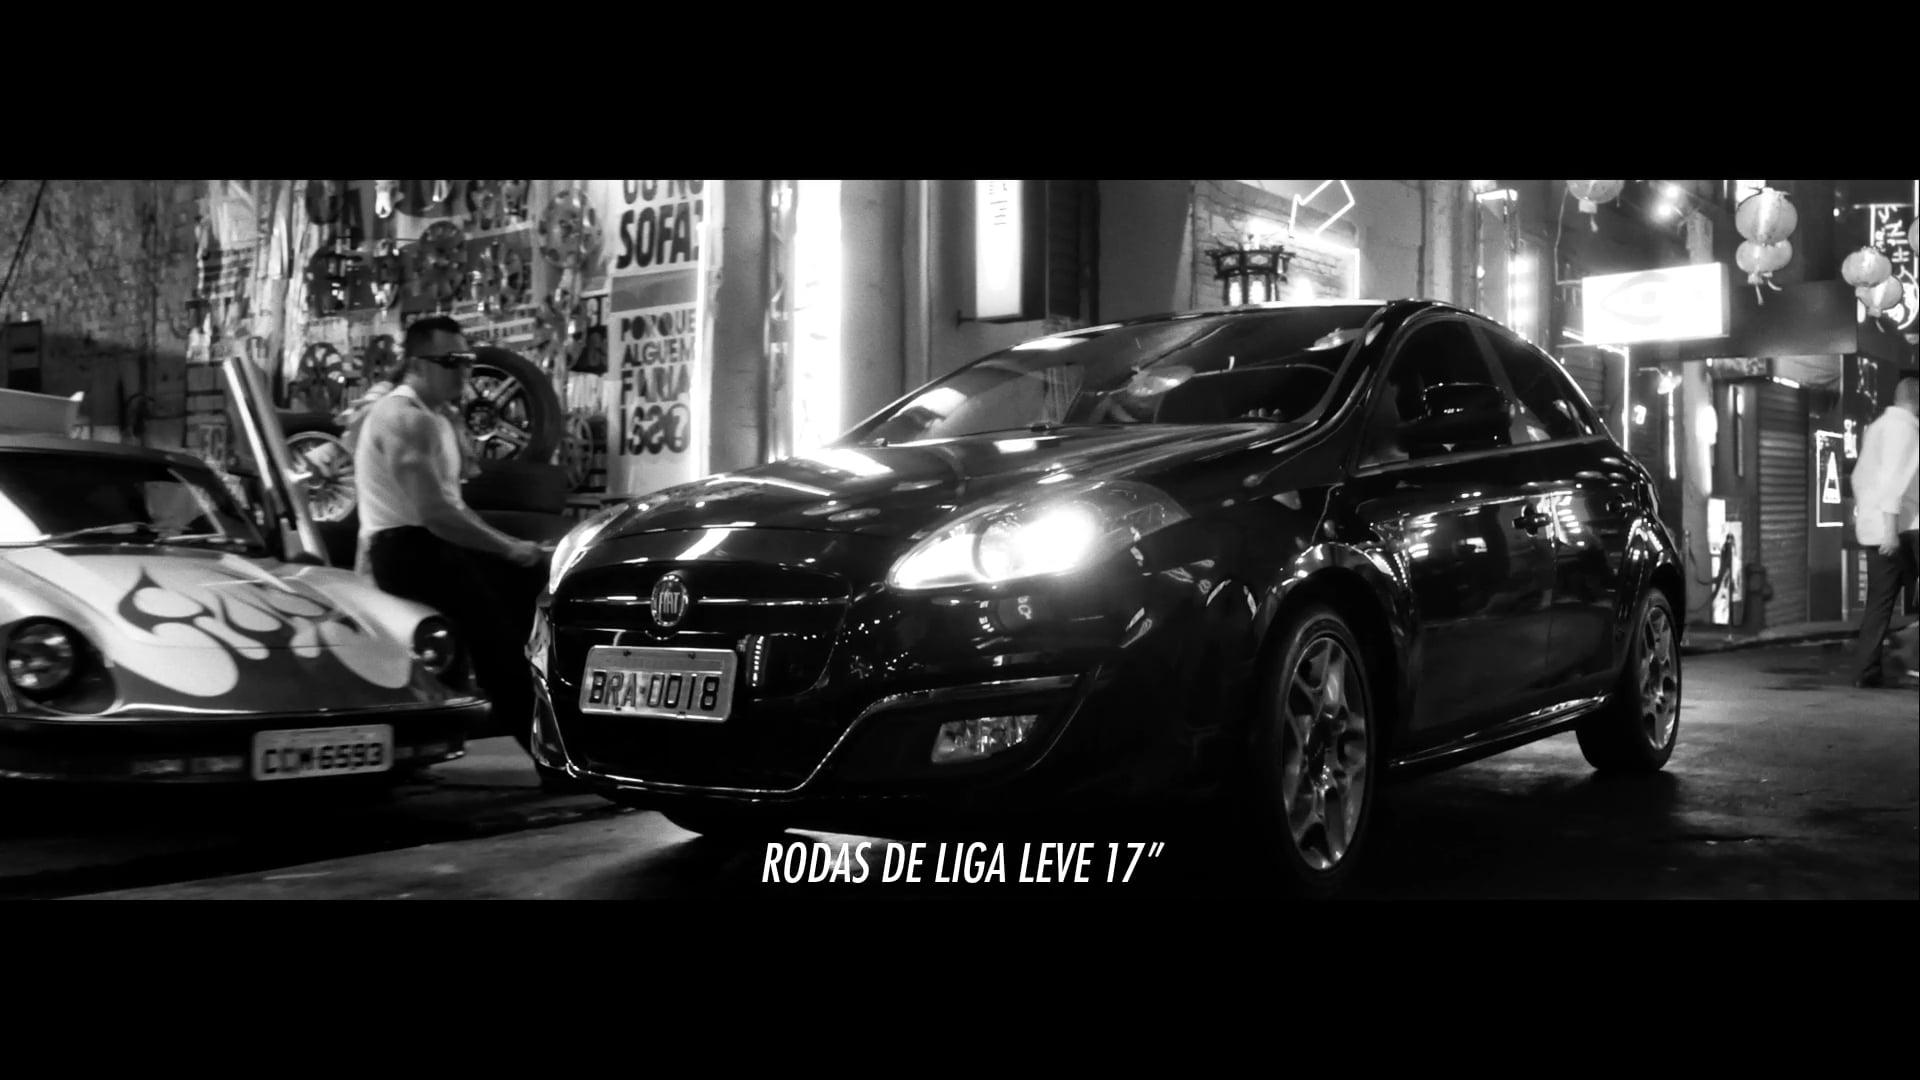 Fiat - Bravo (Noir)